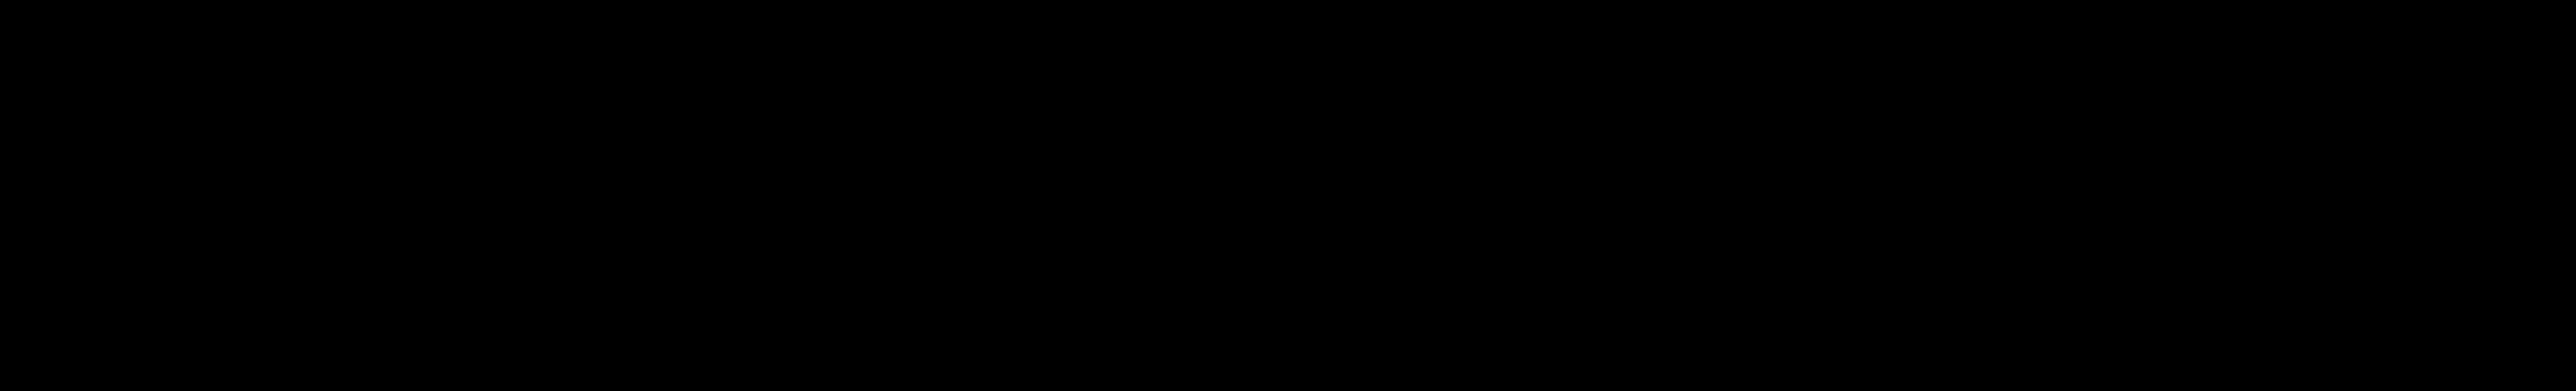 Vestin Capital Group